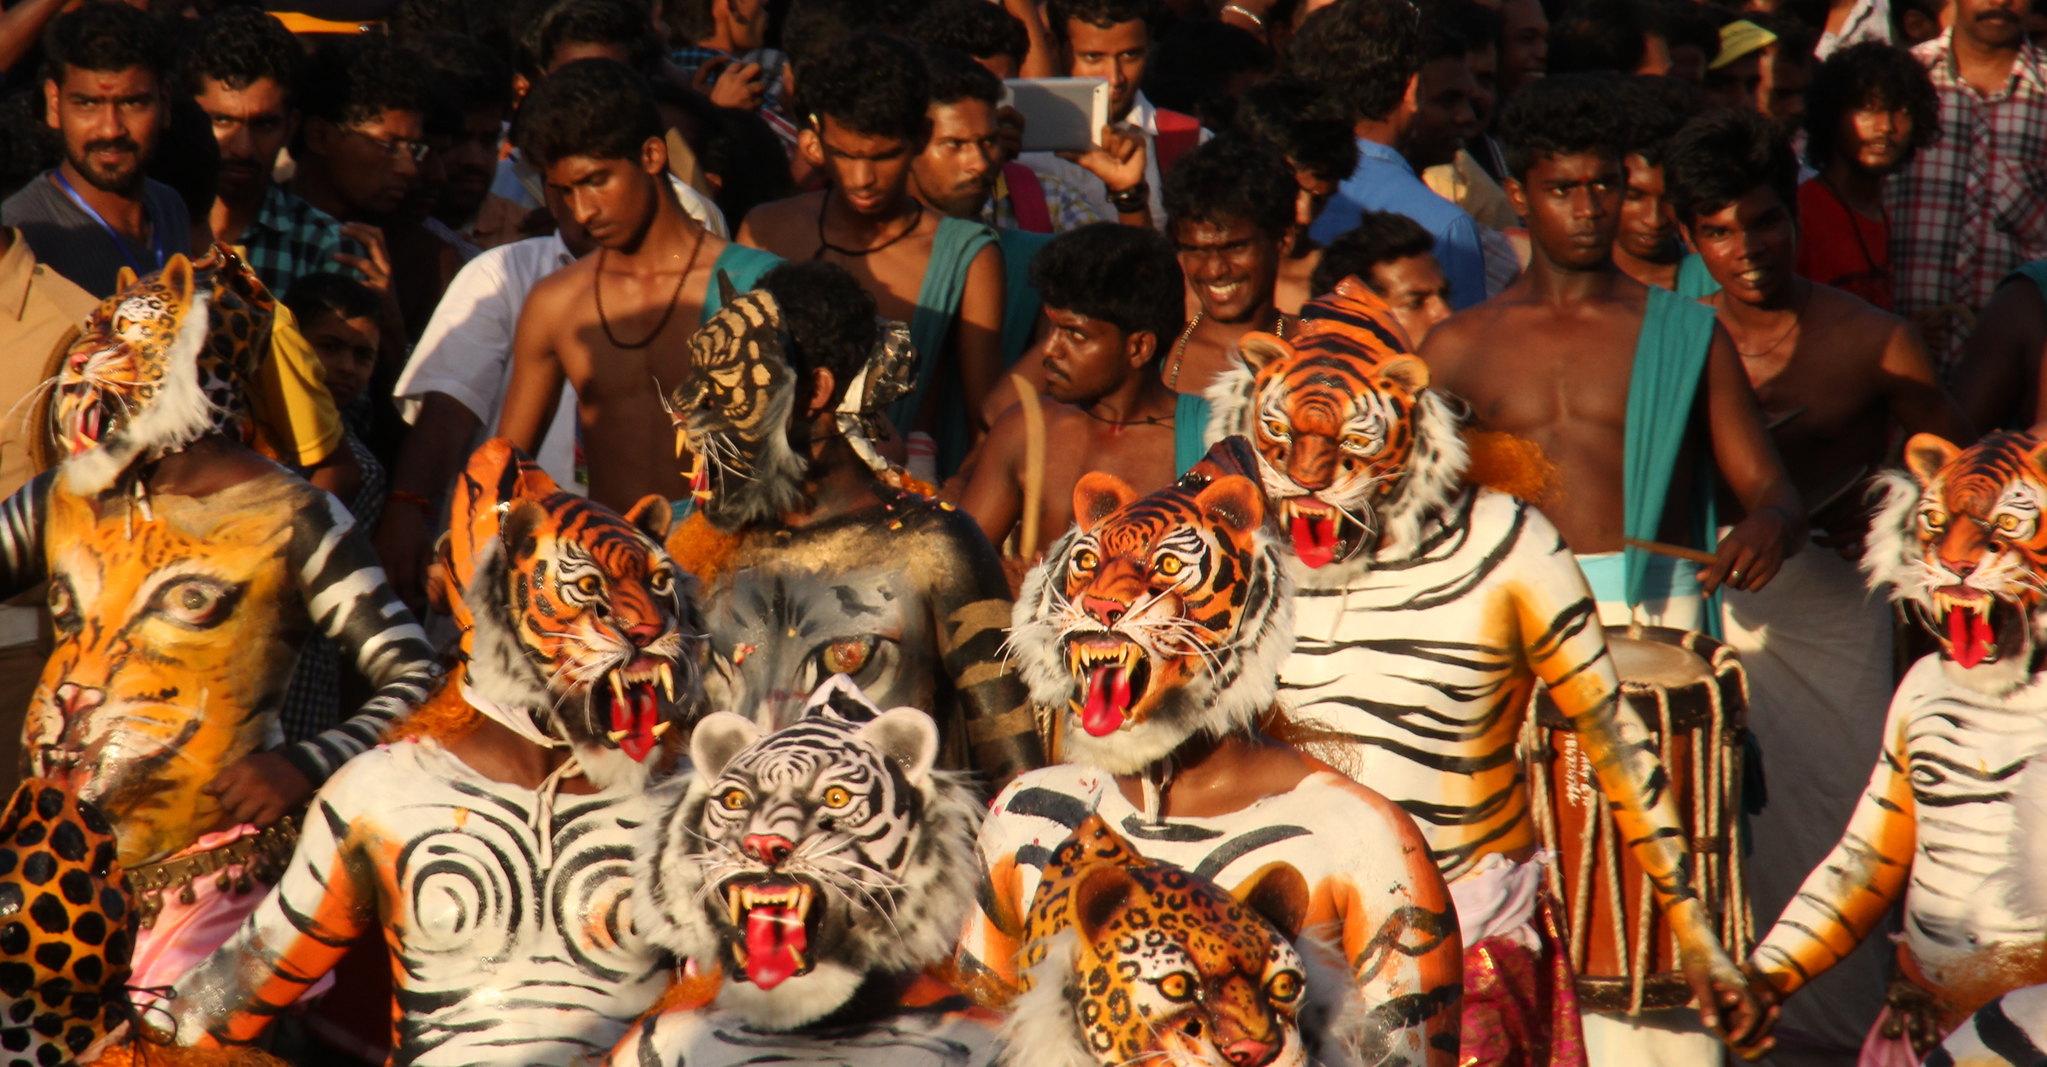 Pulikali tigers dancing in Thrissur on Onam